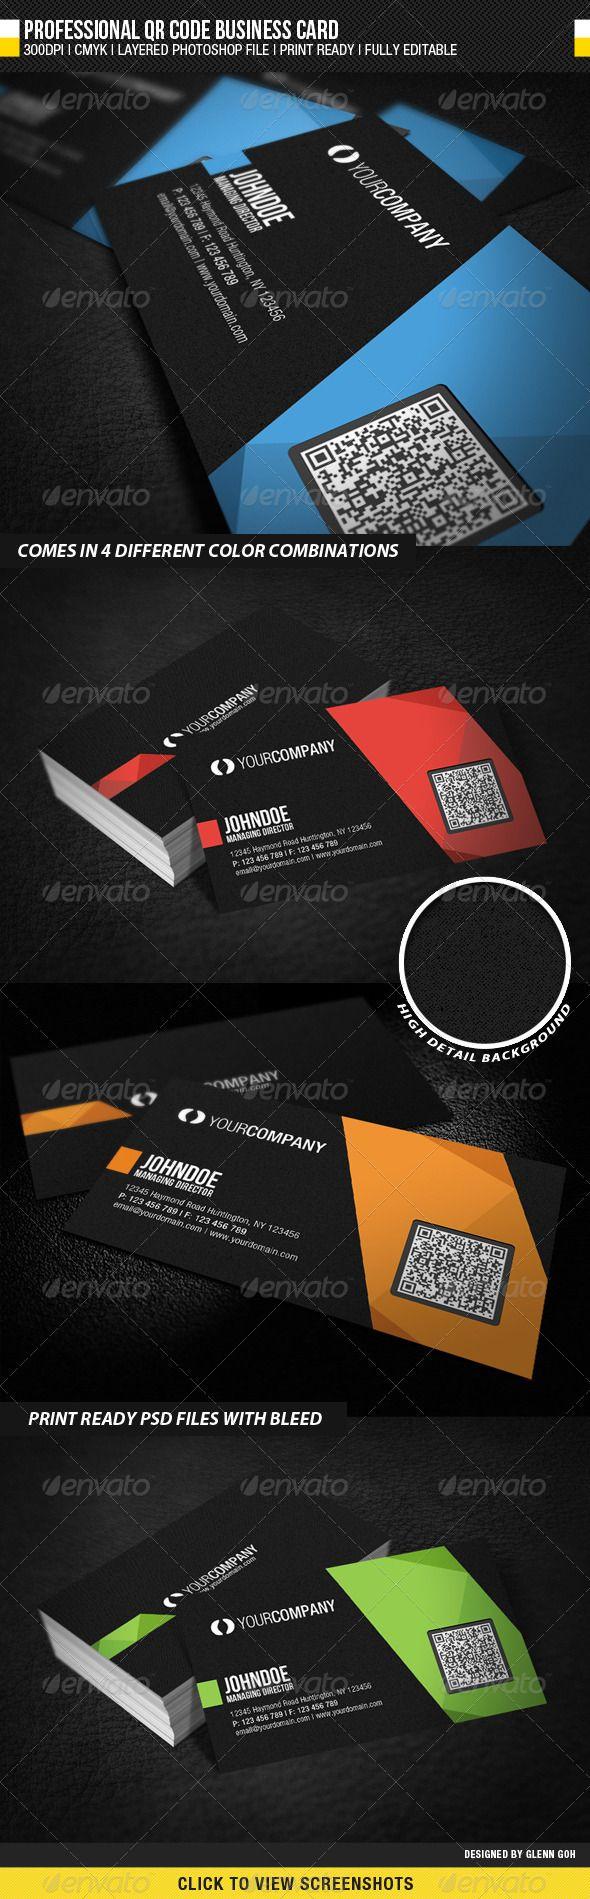 Professional qr code business card qr codes business cards and professional qr code business card colourmoves